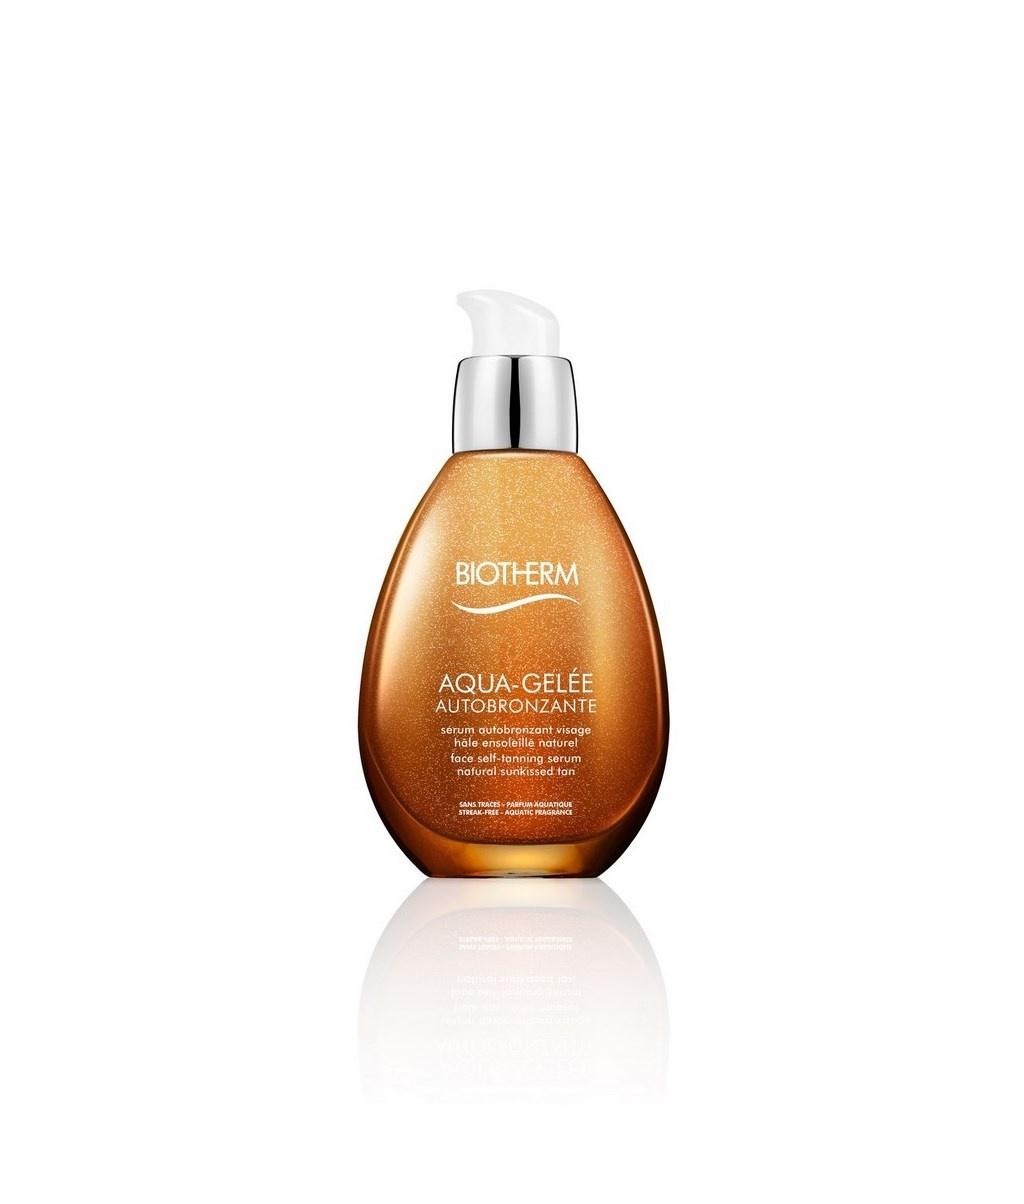 Biotherm Aqua-Gelée Face Self-Tanning Serum, 50 ml